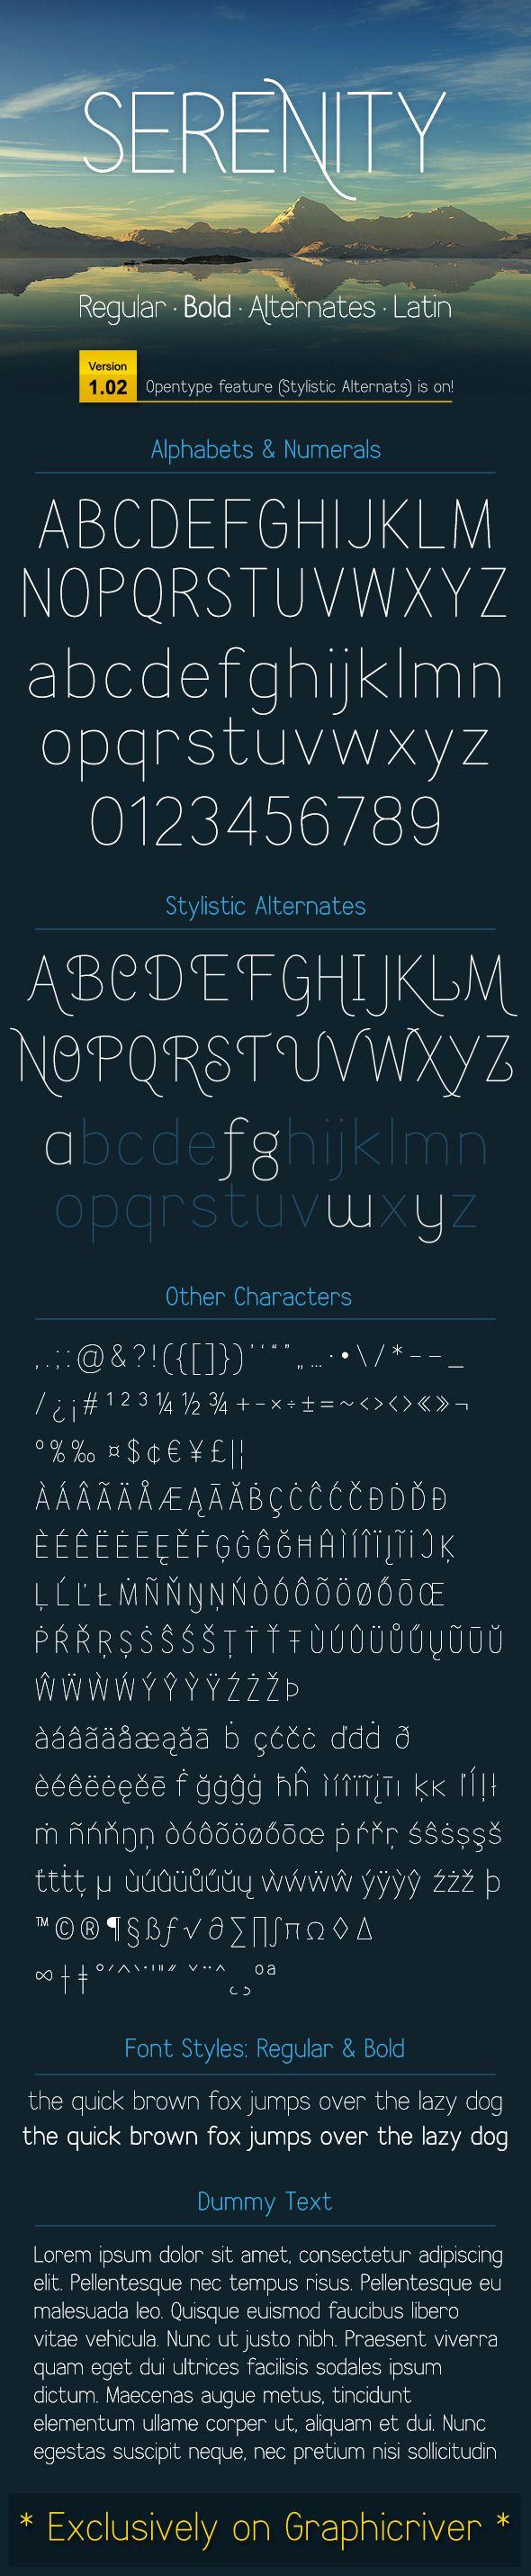 SERENITY font - Sans-Serif Fonts